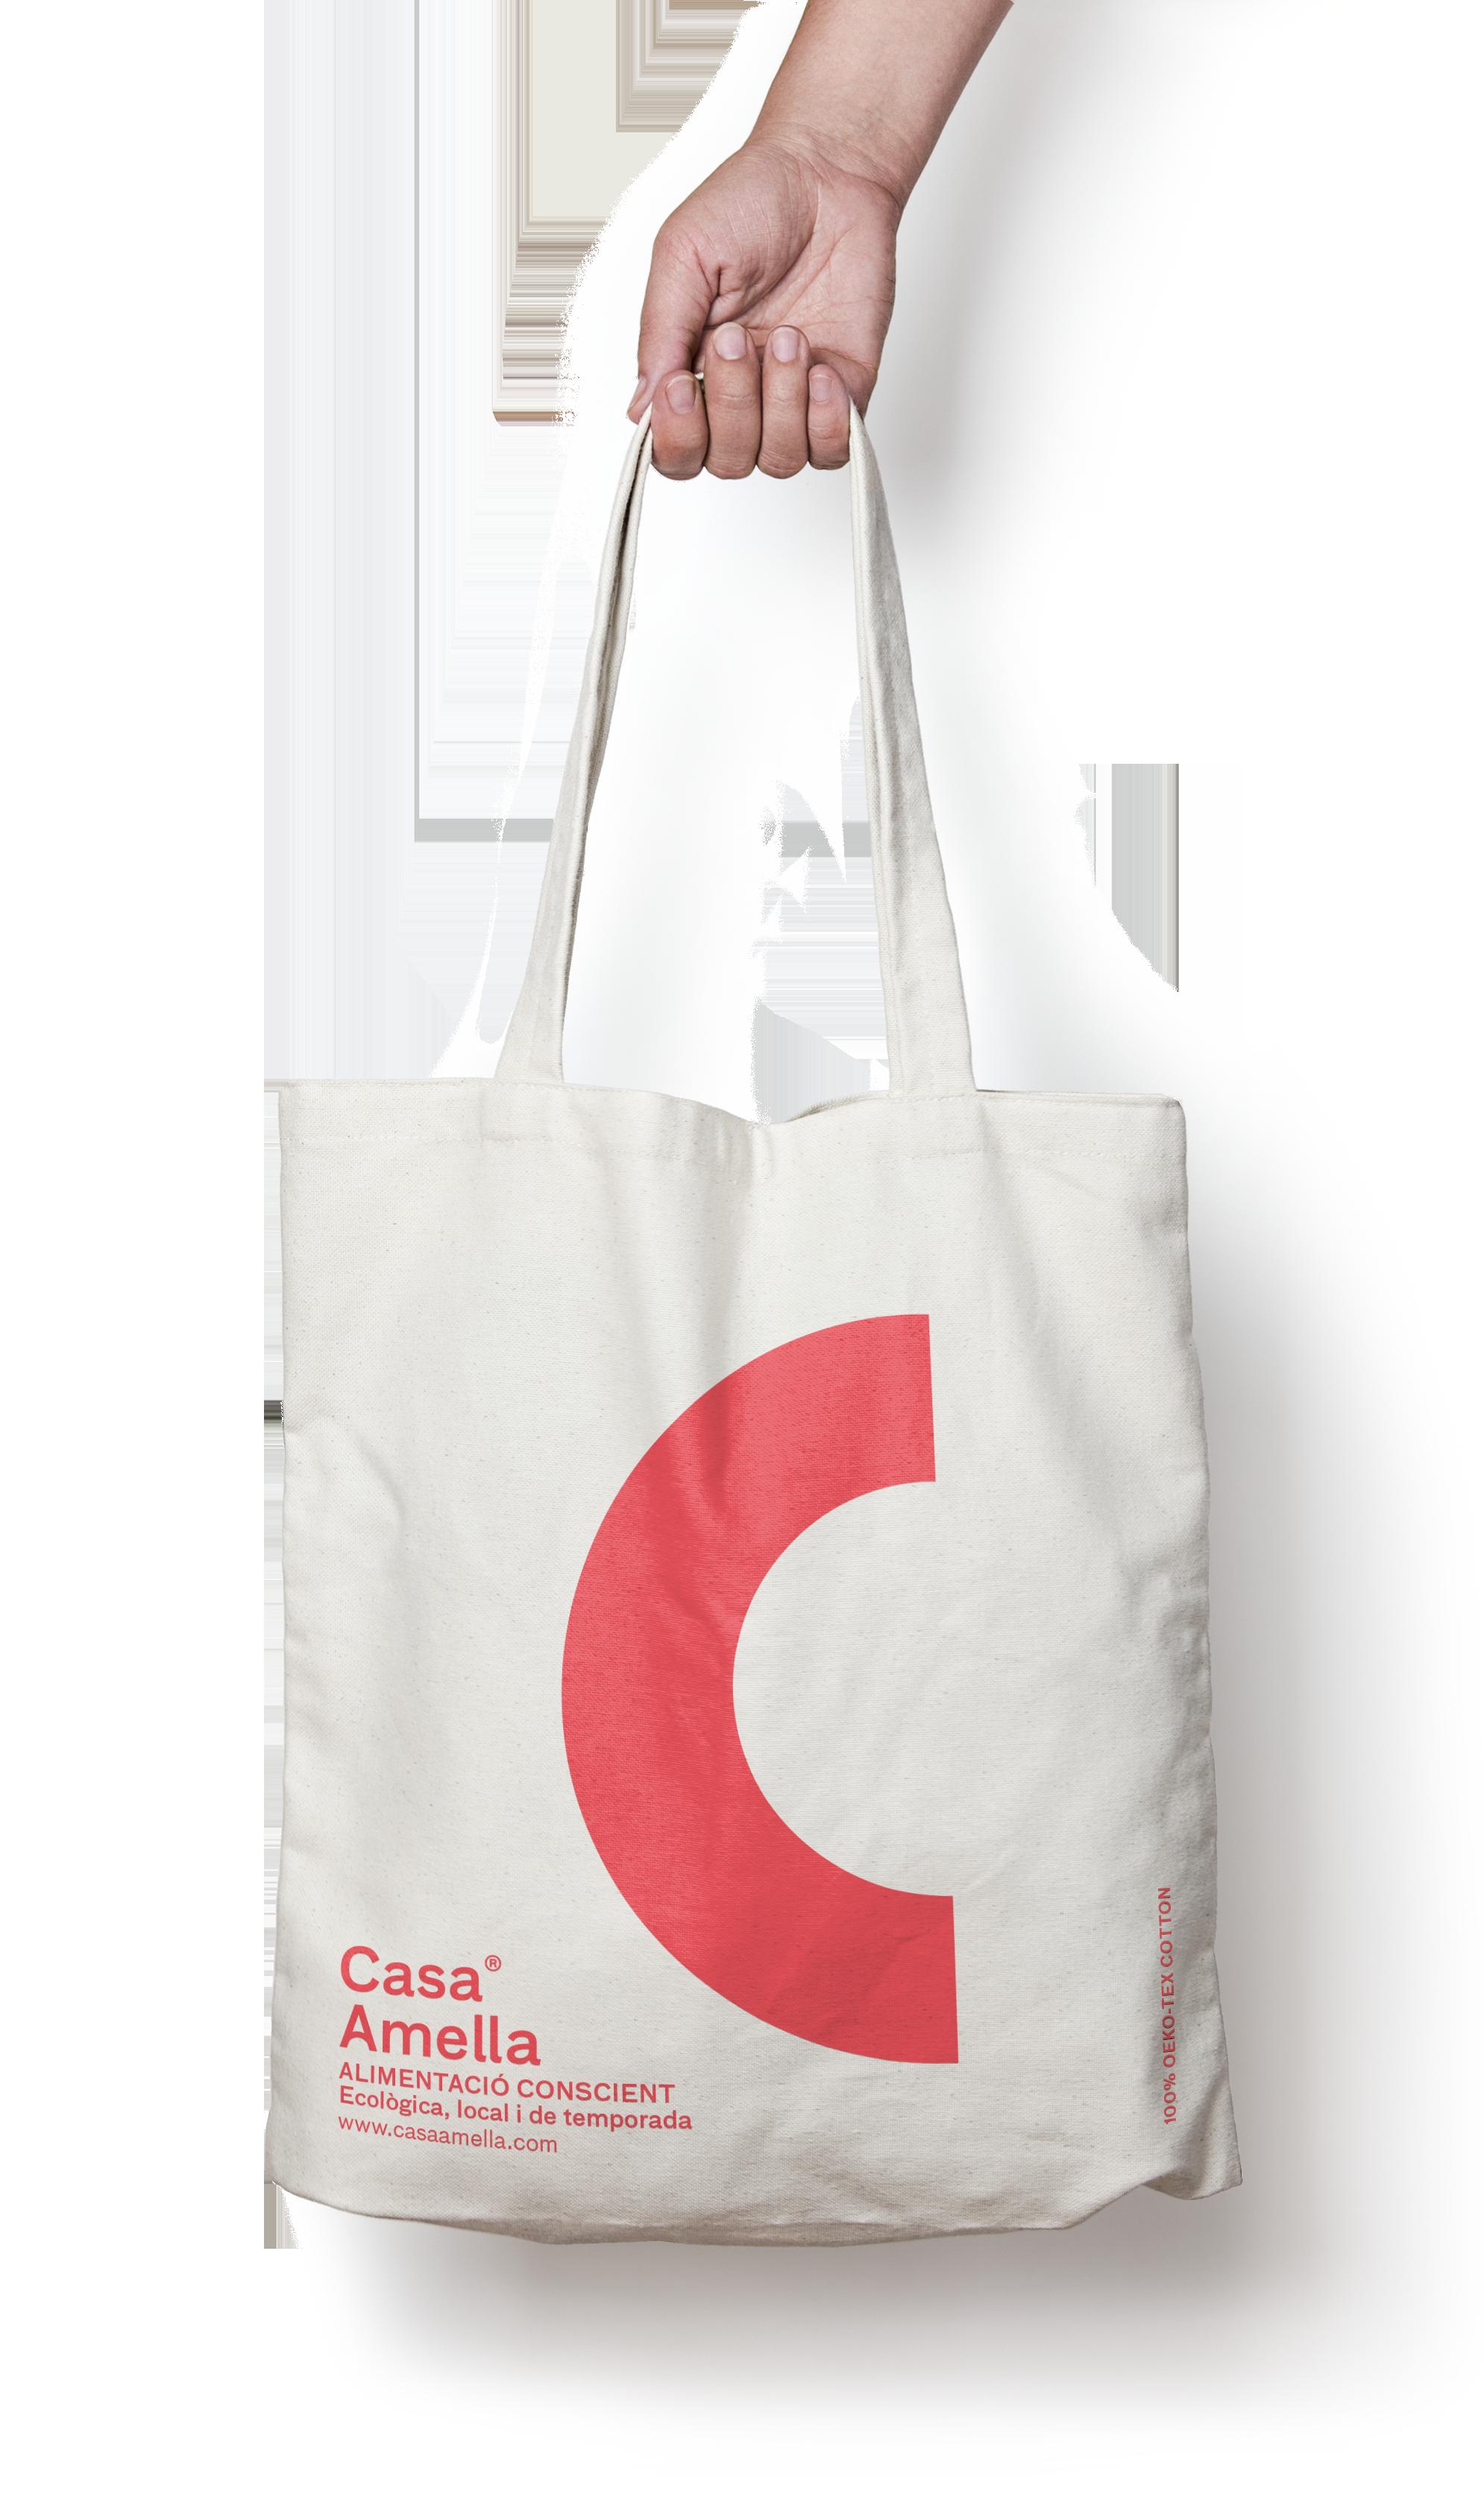 Et regalem… la bossa de cotó sostenible!